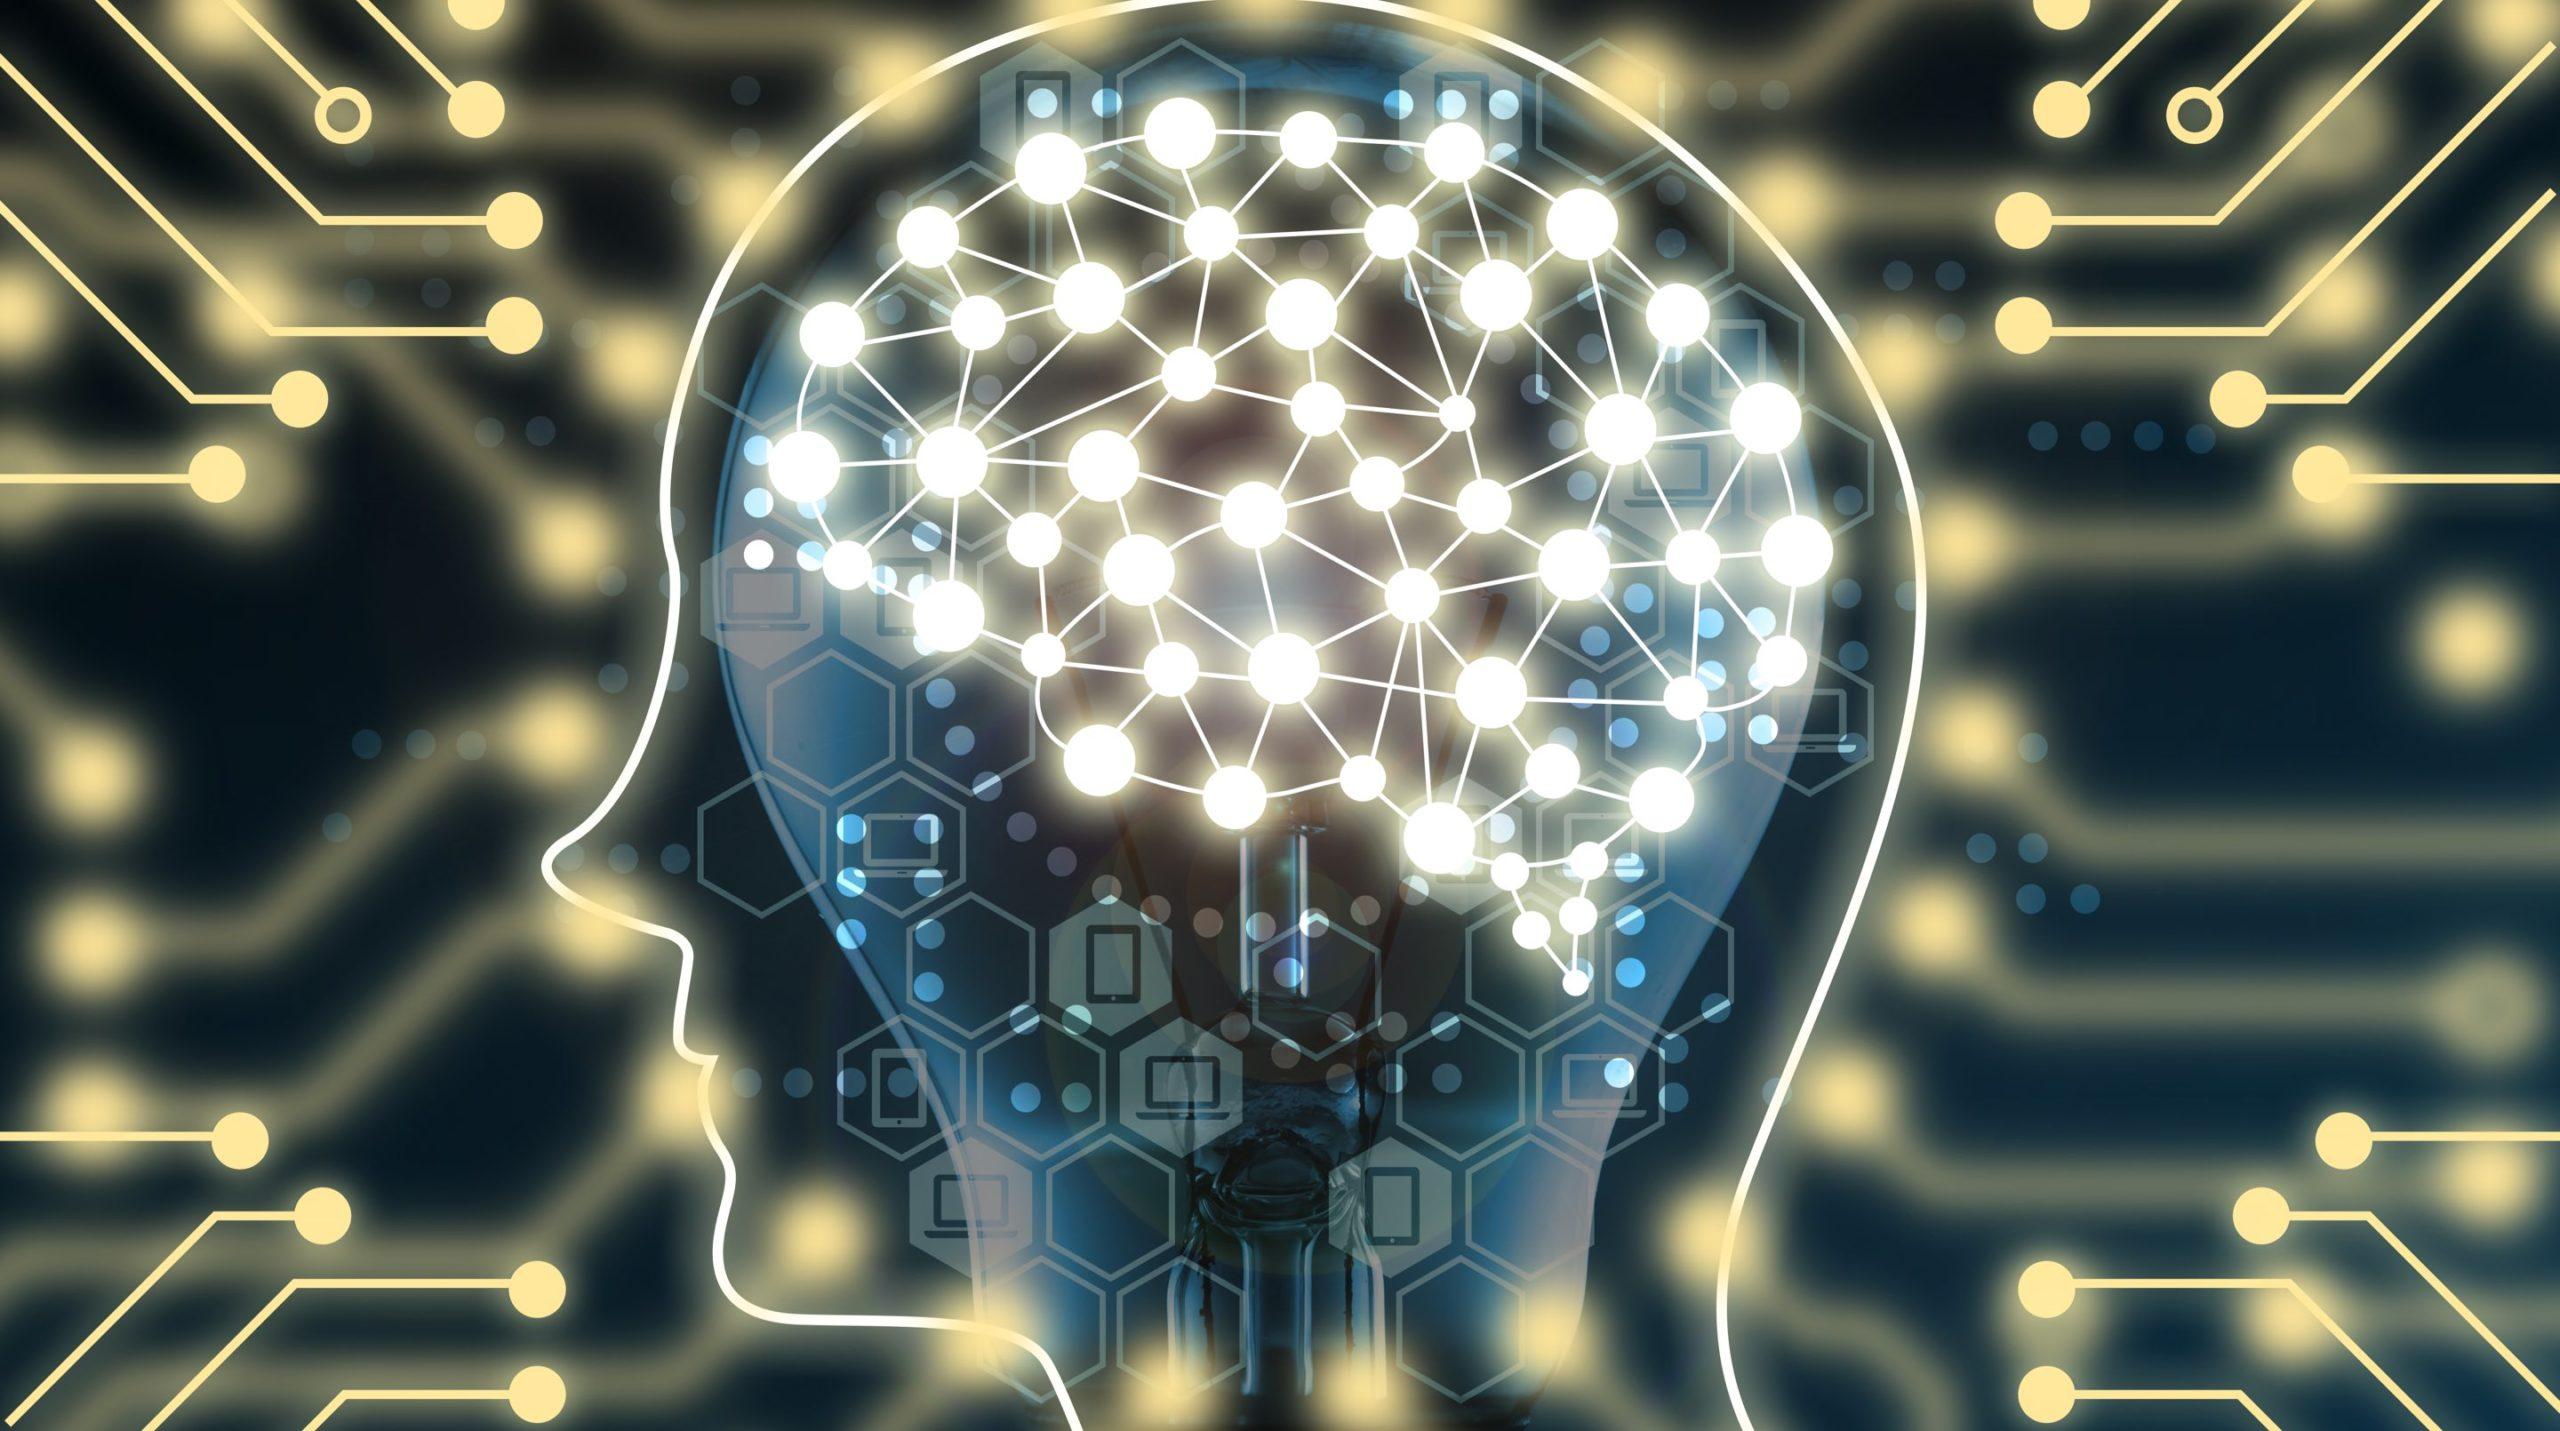 blog-banner-Enhancing-IBM-Datacap-with-Watson's-machine-learning-capabilities